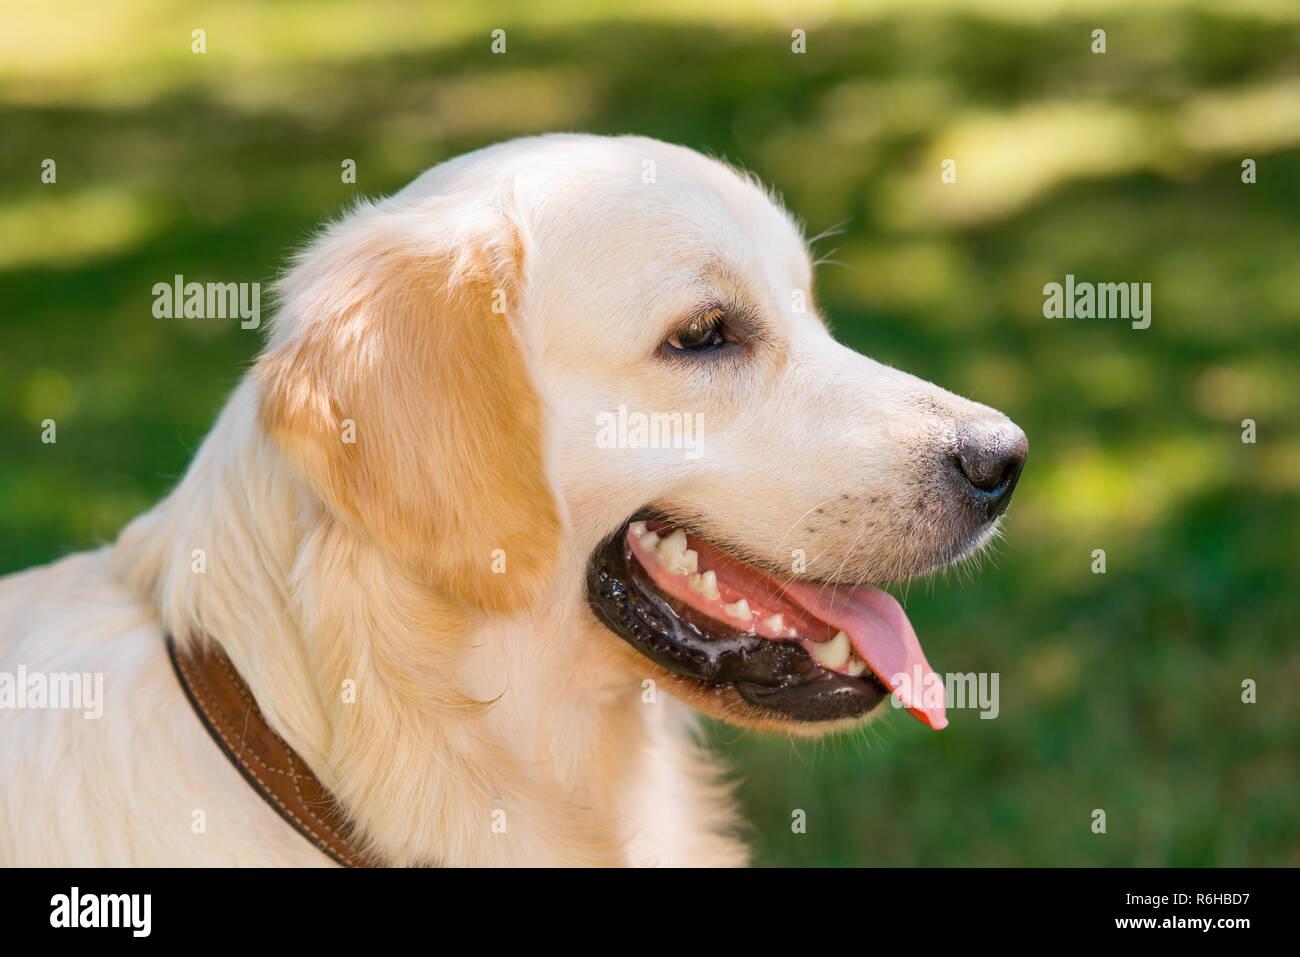 Golden retriever dog profile shot - Stock Image